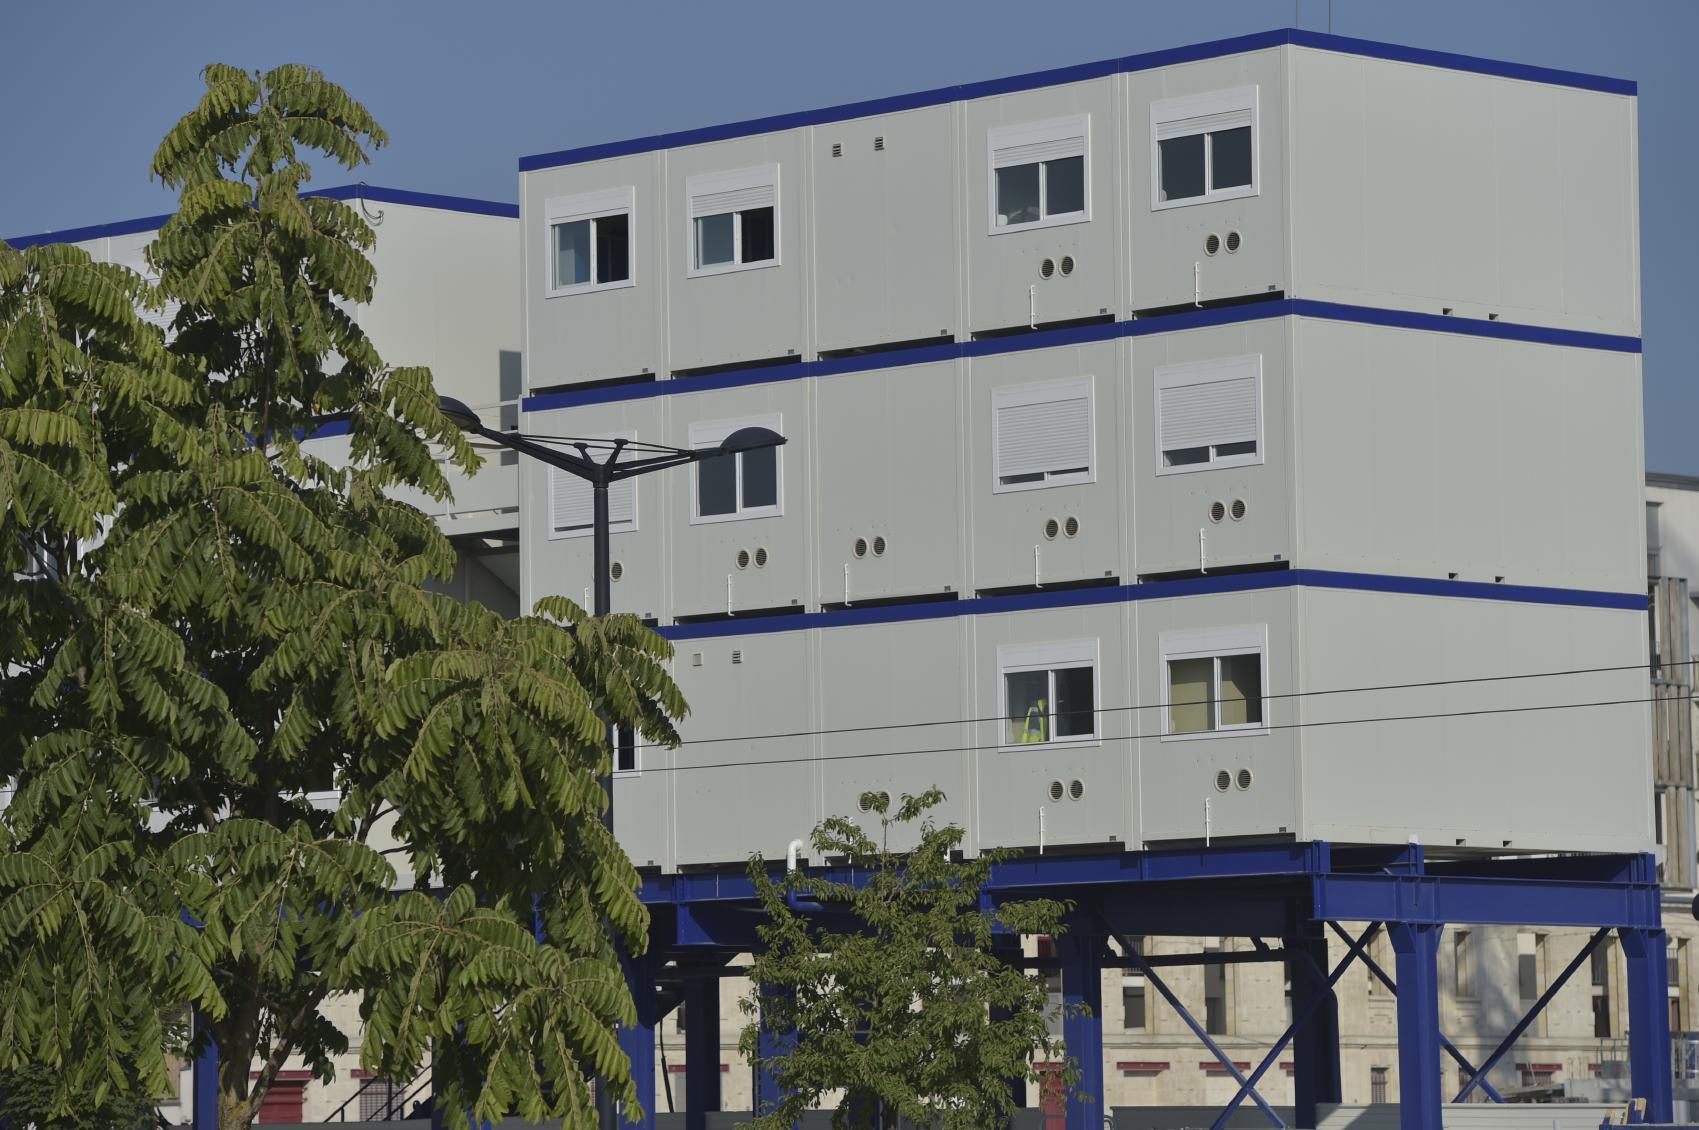 modular building: new kid on the everblock